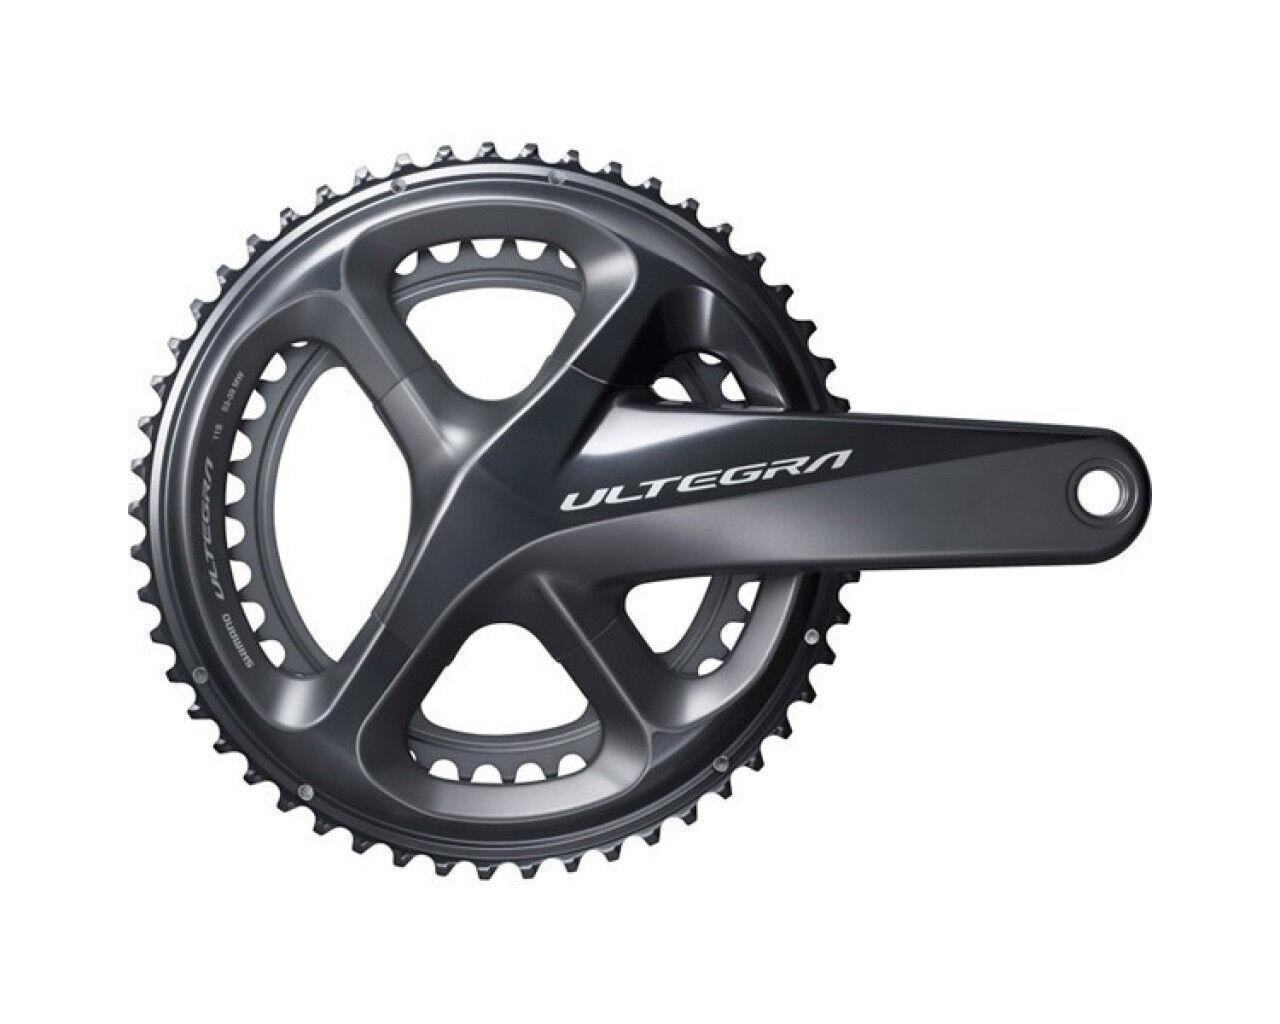 Shimano Ultegra FC-R8000 11s Road Touring Bike Crankset 170 or 172.5 or 175